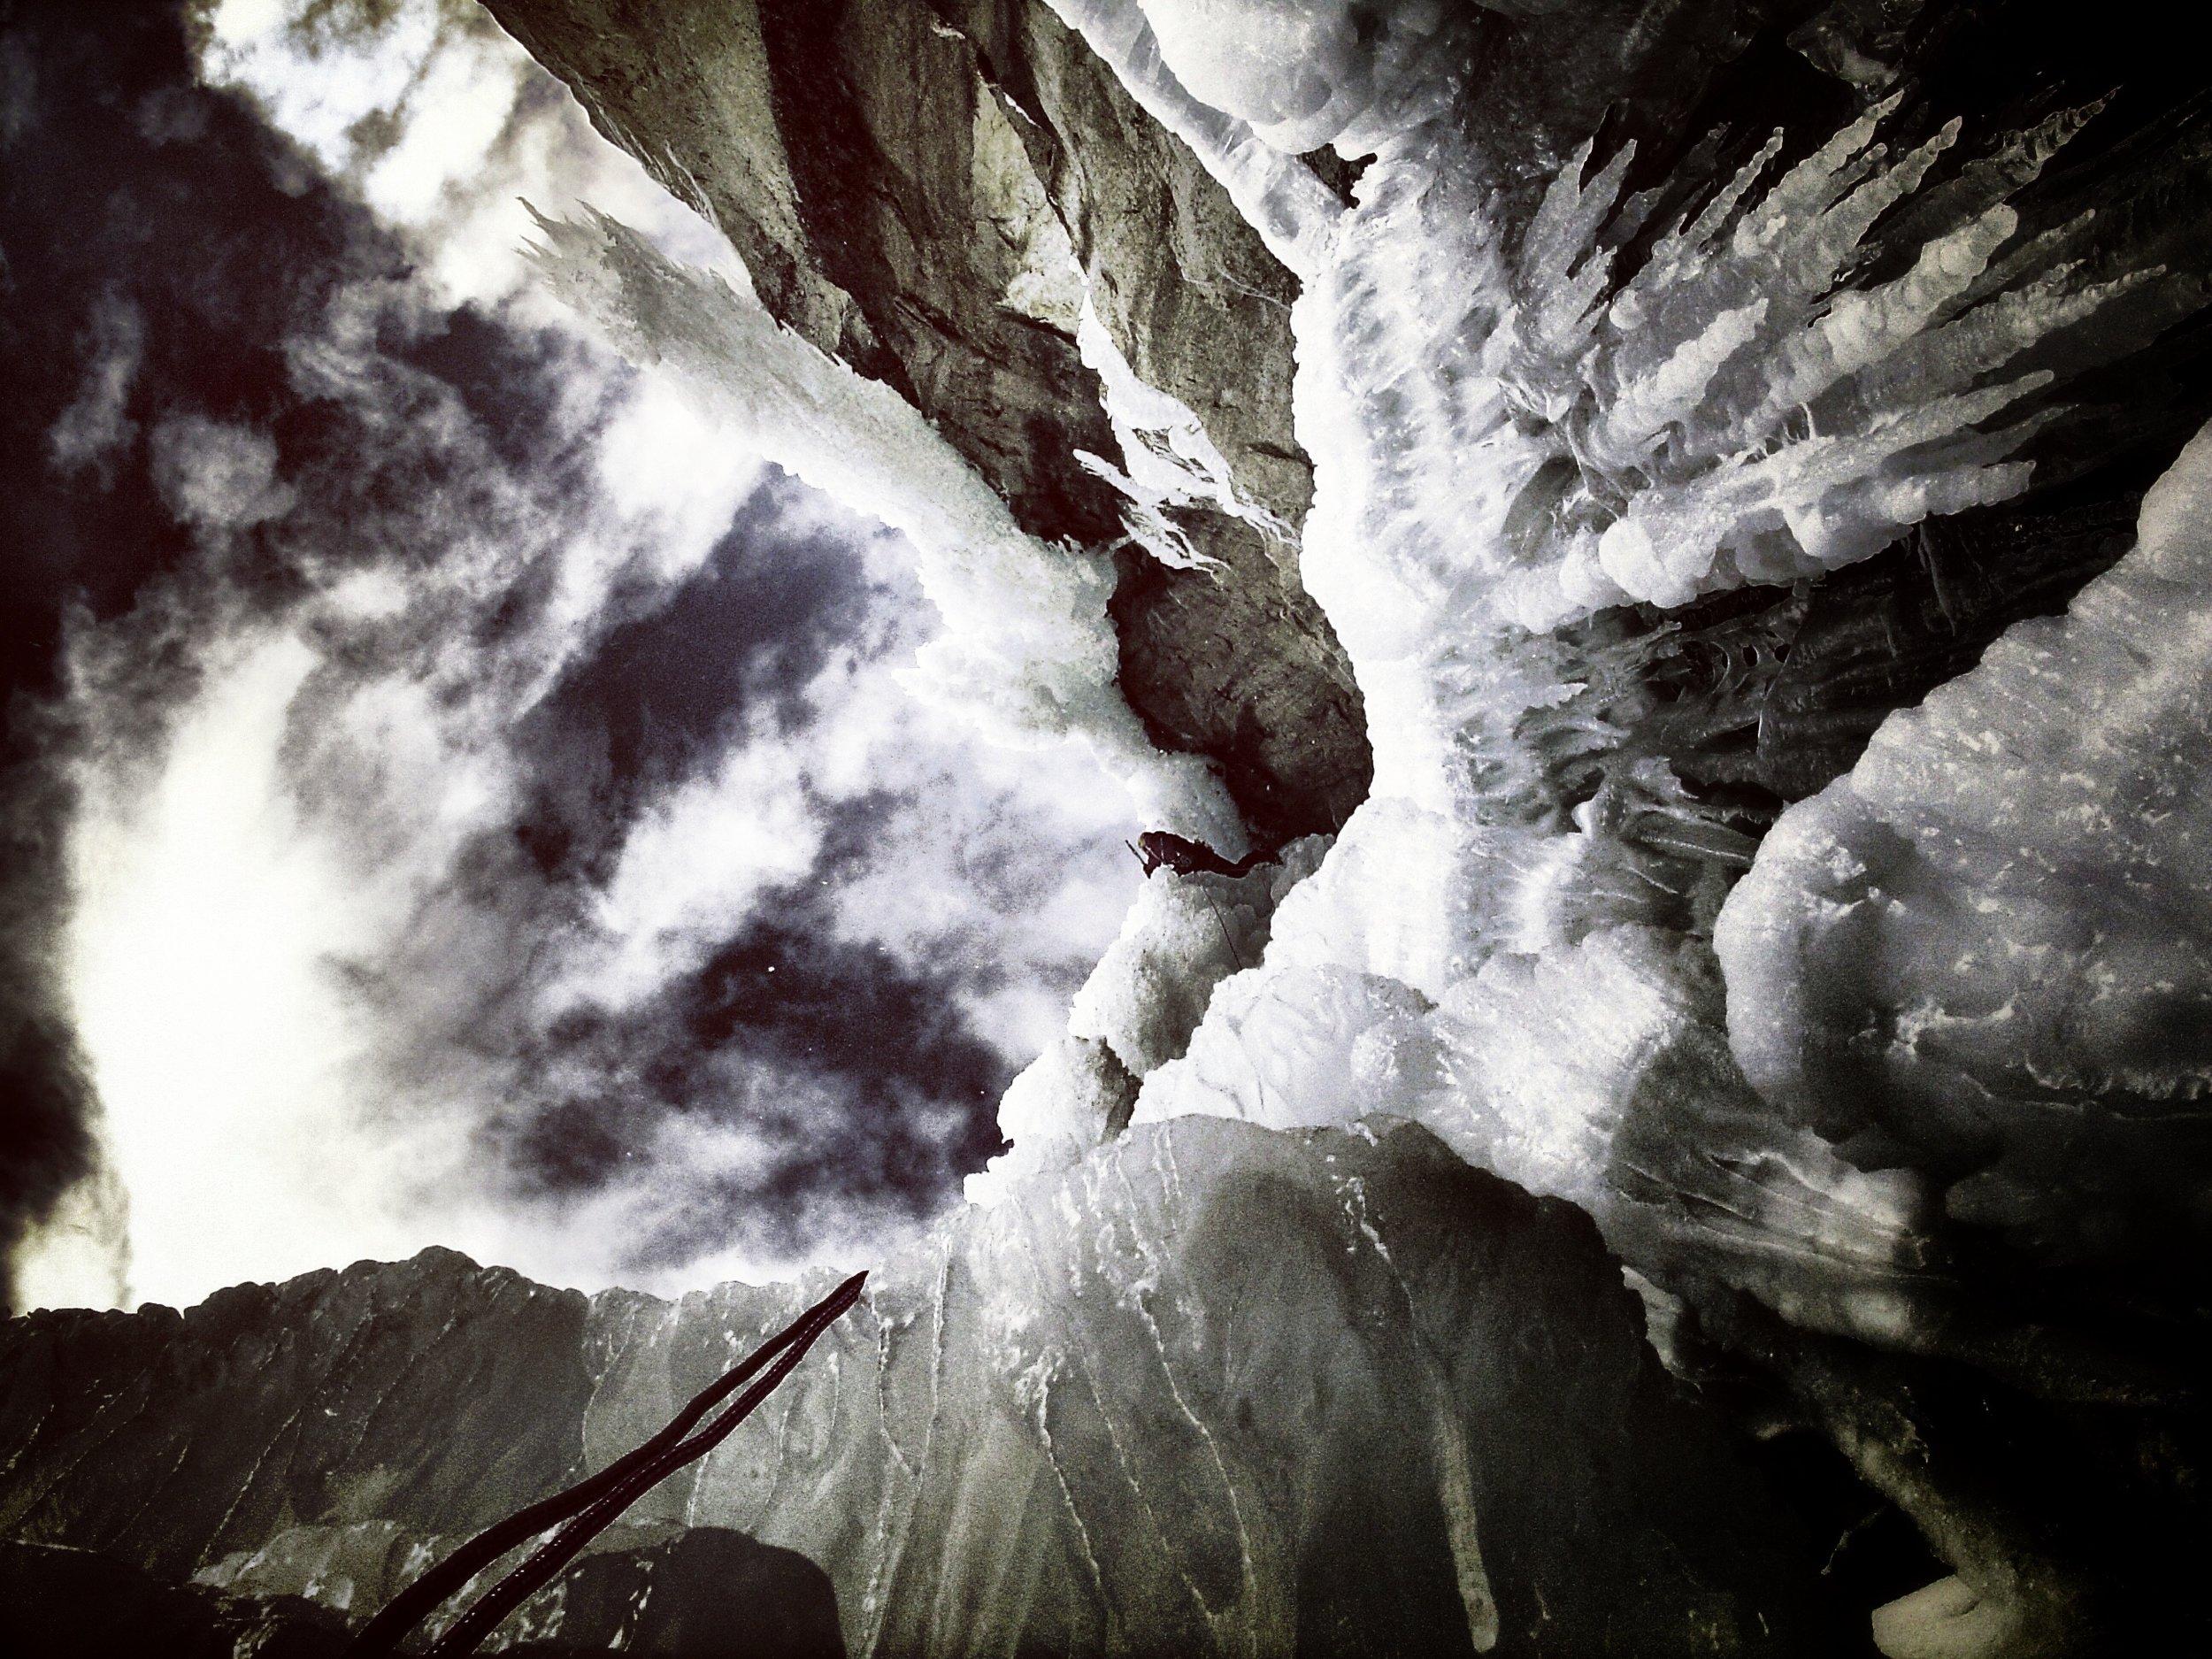 Matthias Scherer on Shiva Lingam, Argentiere, France - picture Tanja Schmitt